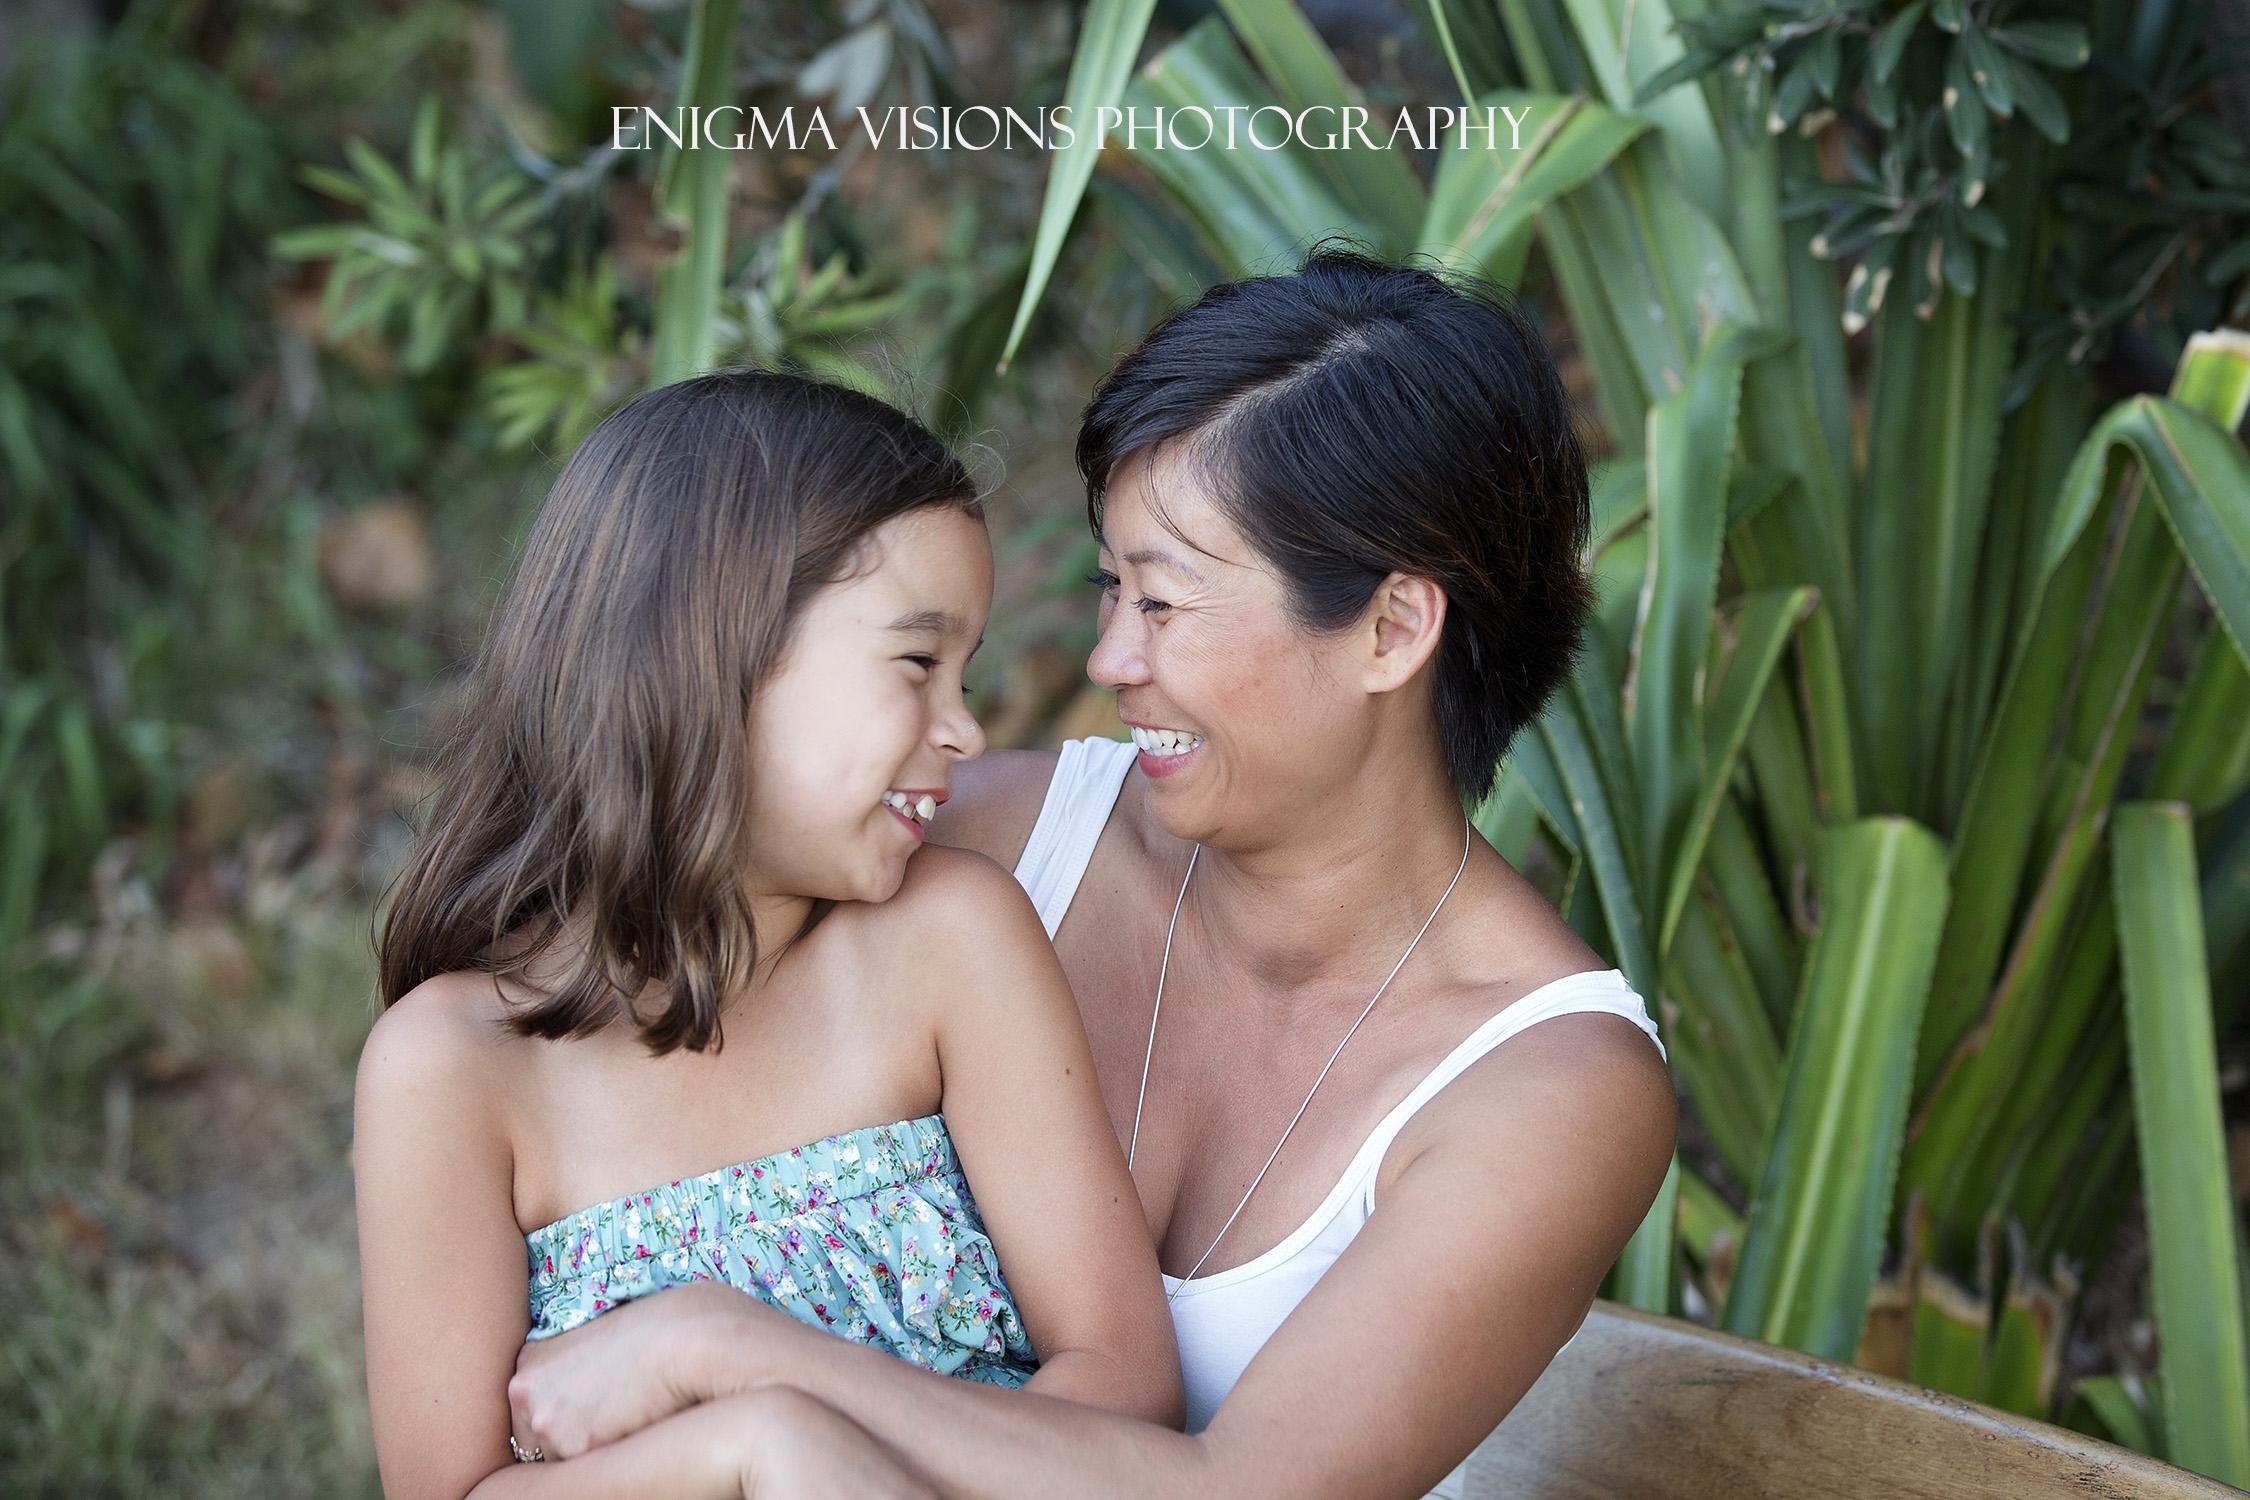 EnigmaVisionsPhotography_FAMILY_Sarah (6).jpg